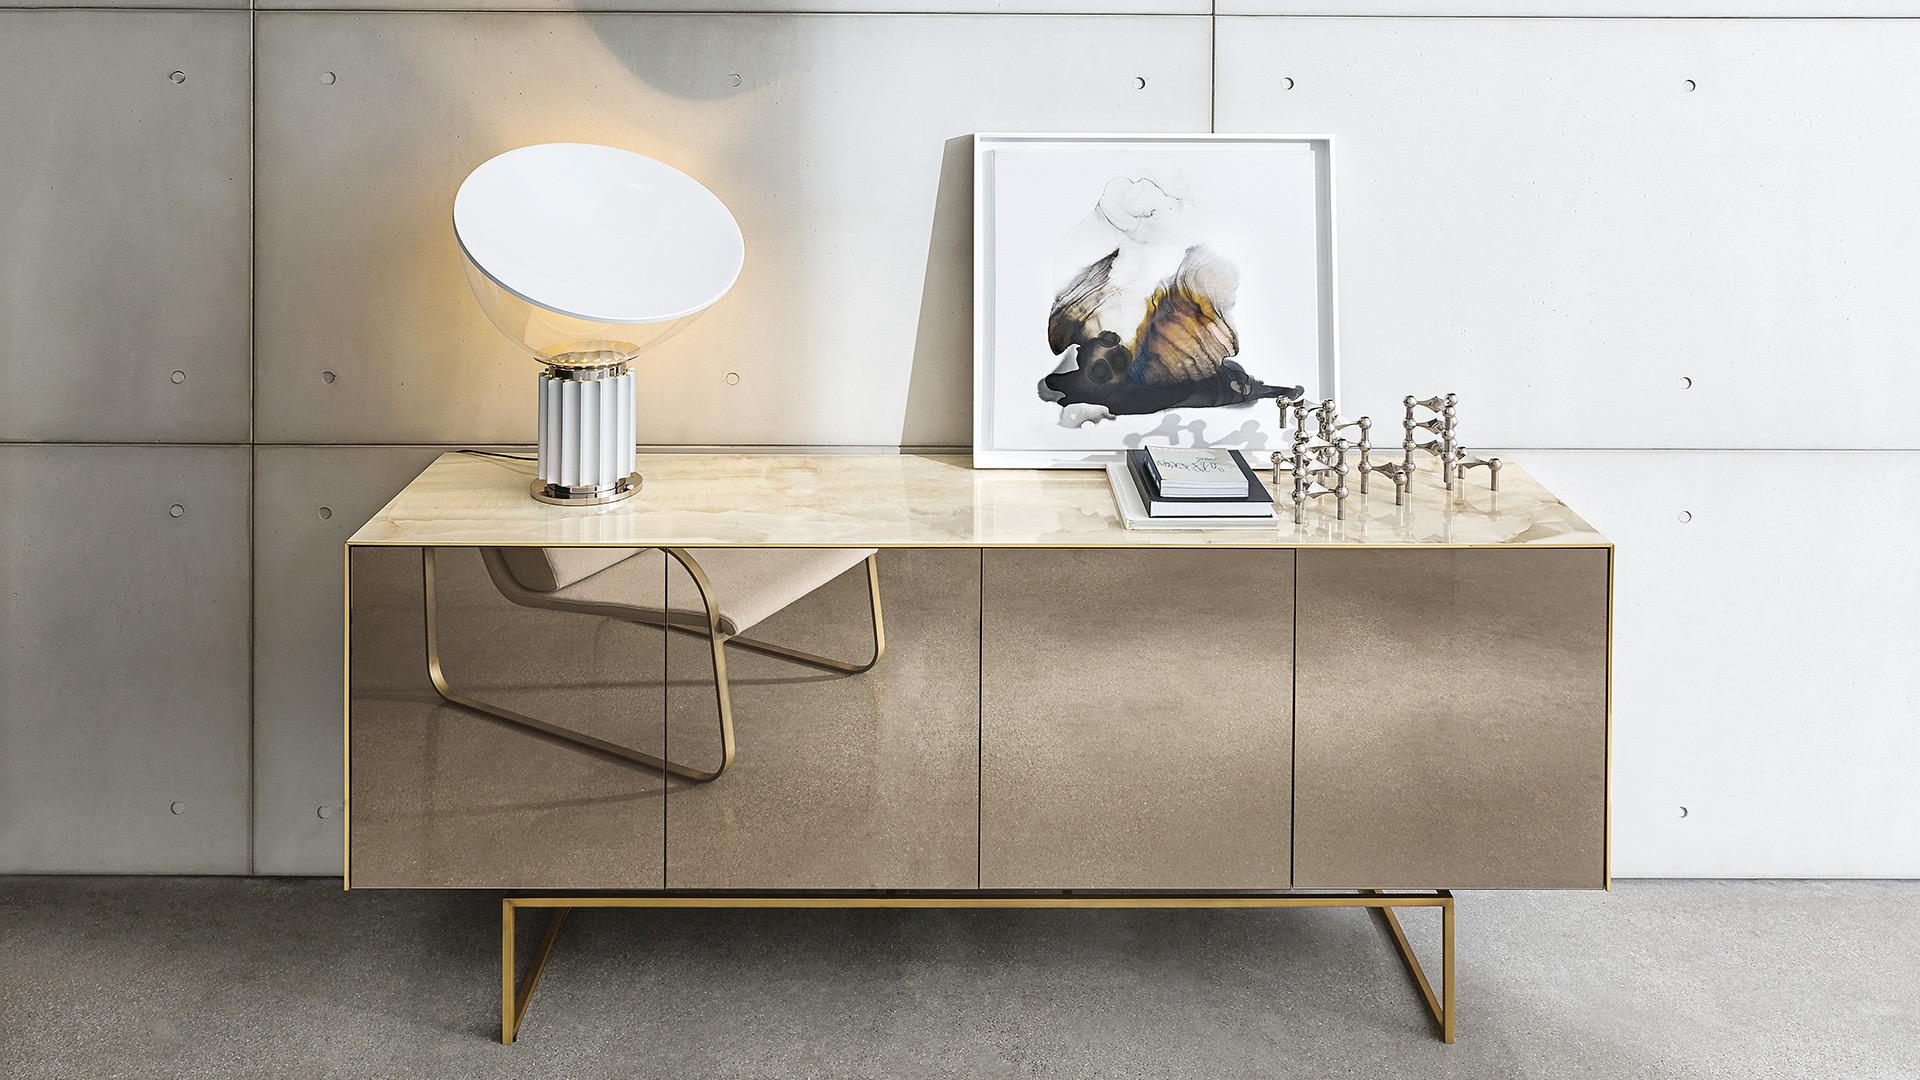 Magda madia di design in ceramica e specchio sovet for Madie di design